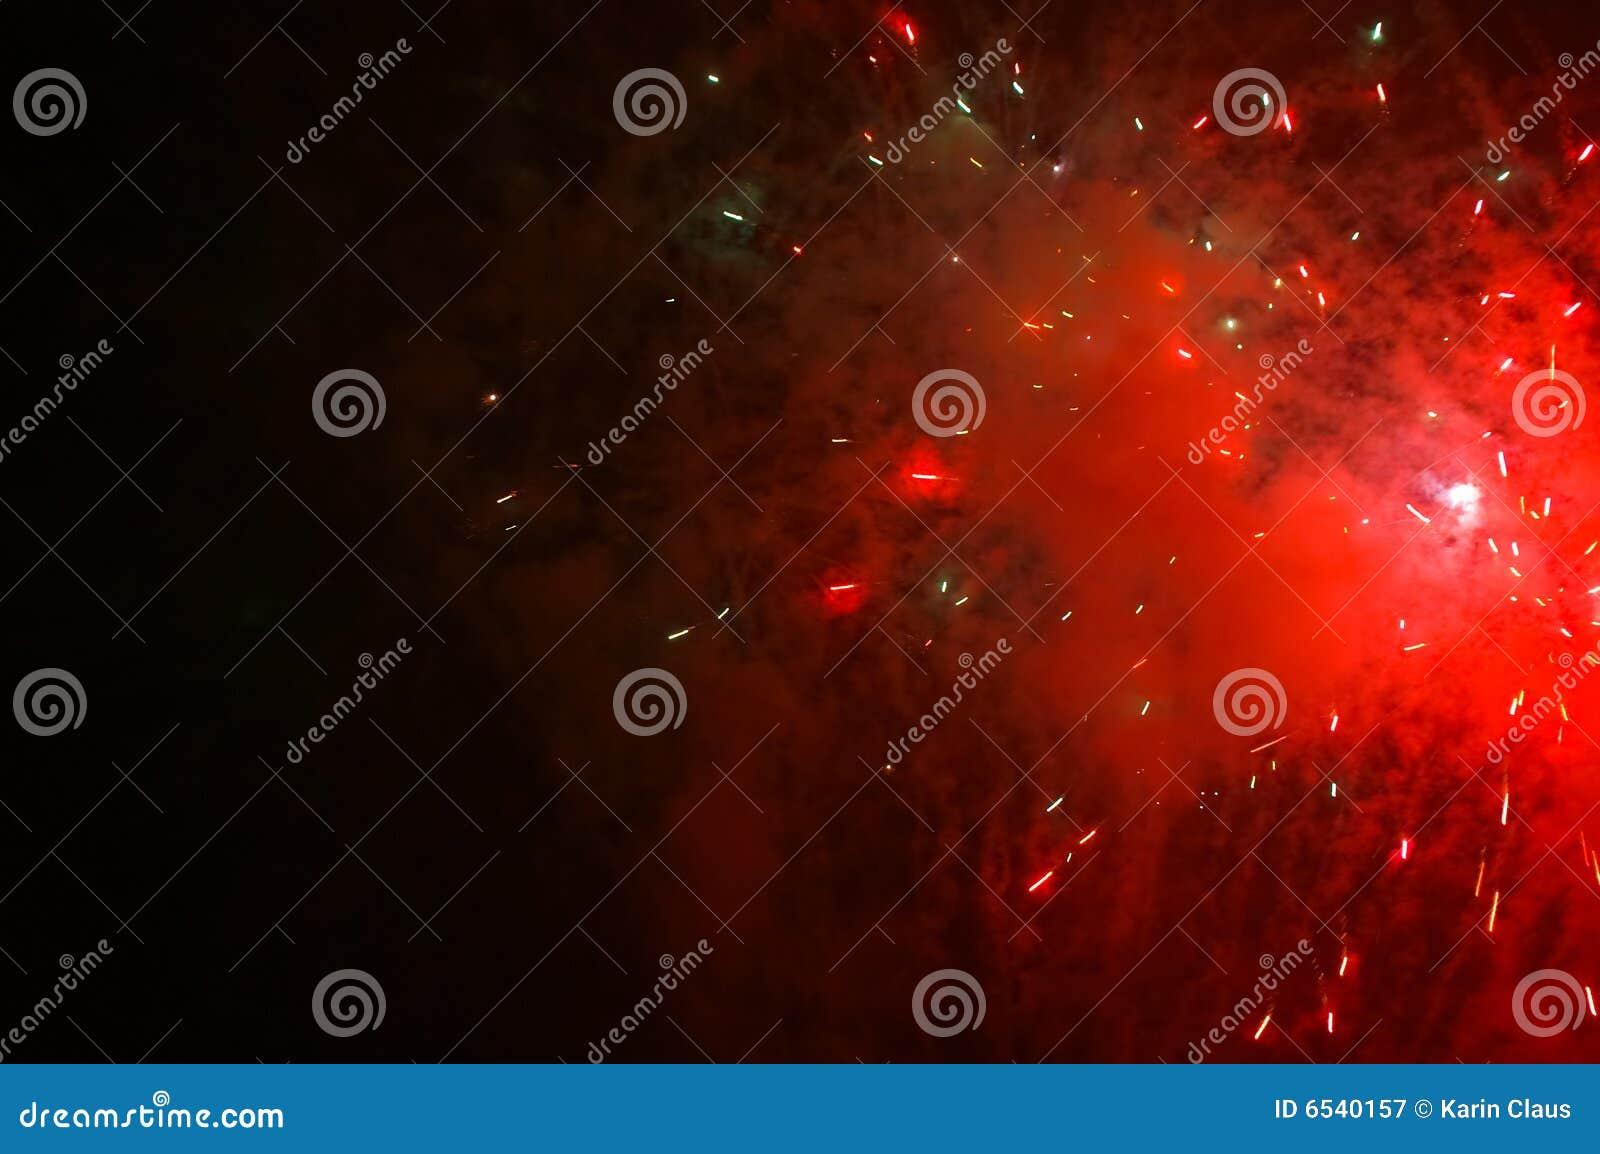 Red exploding fireworks on a dark sky